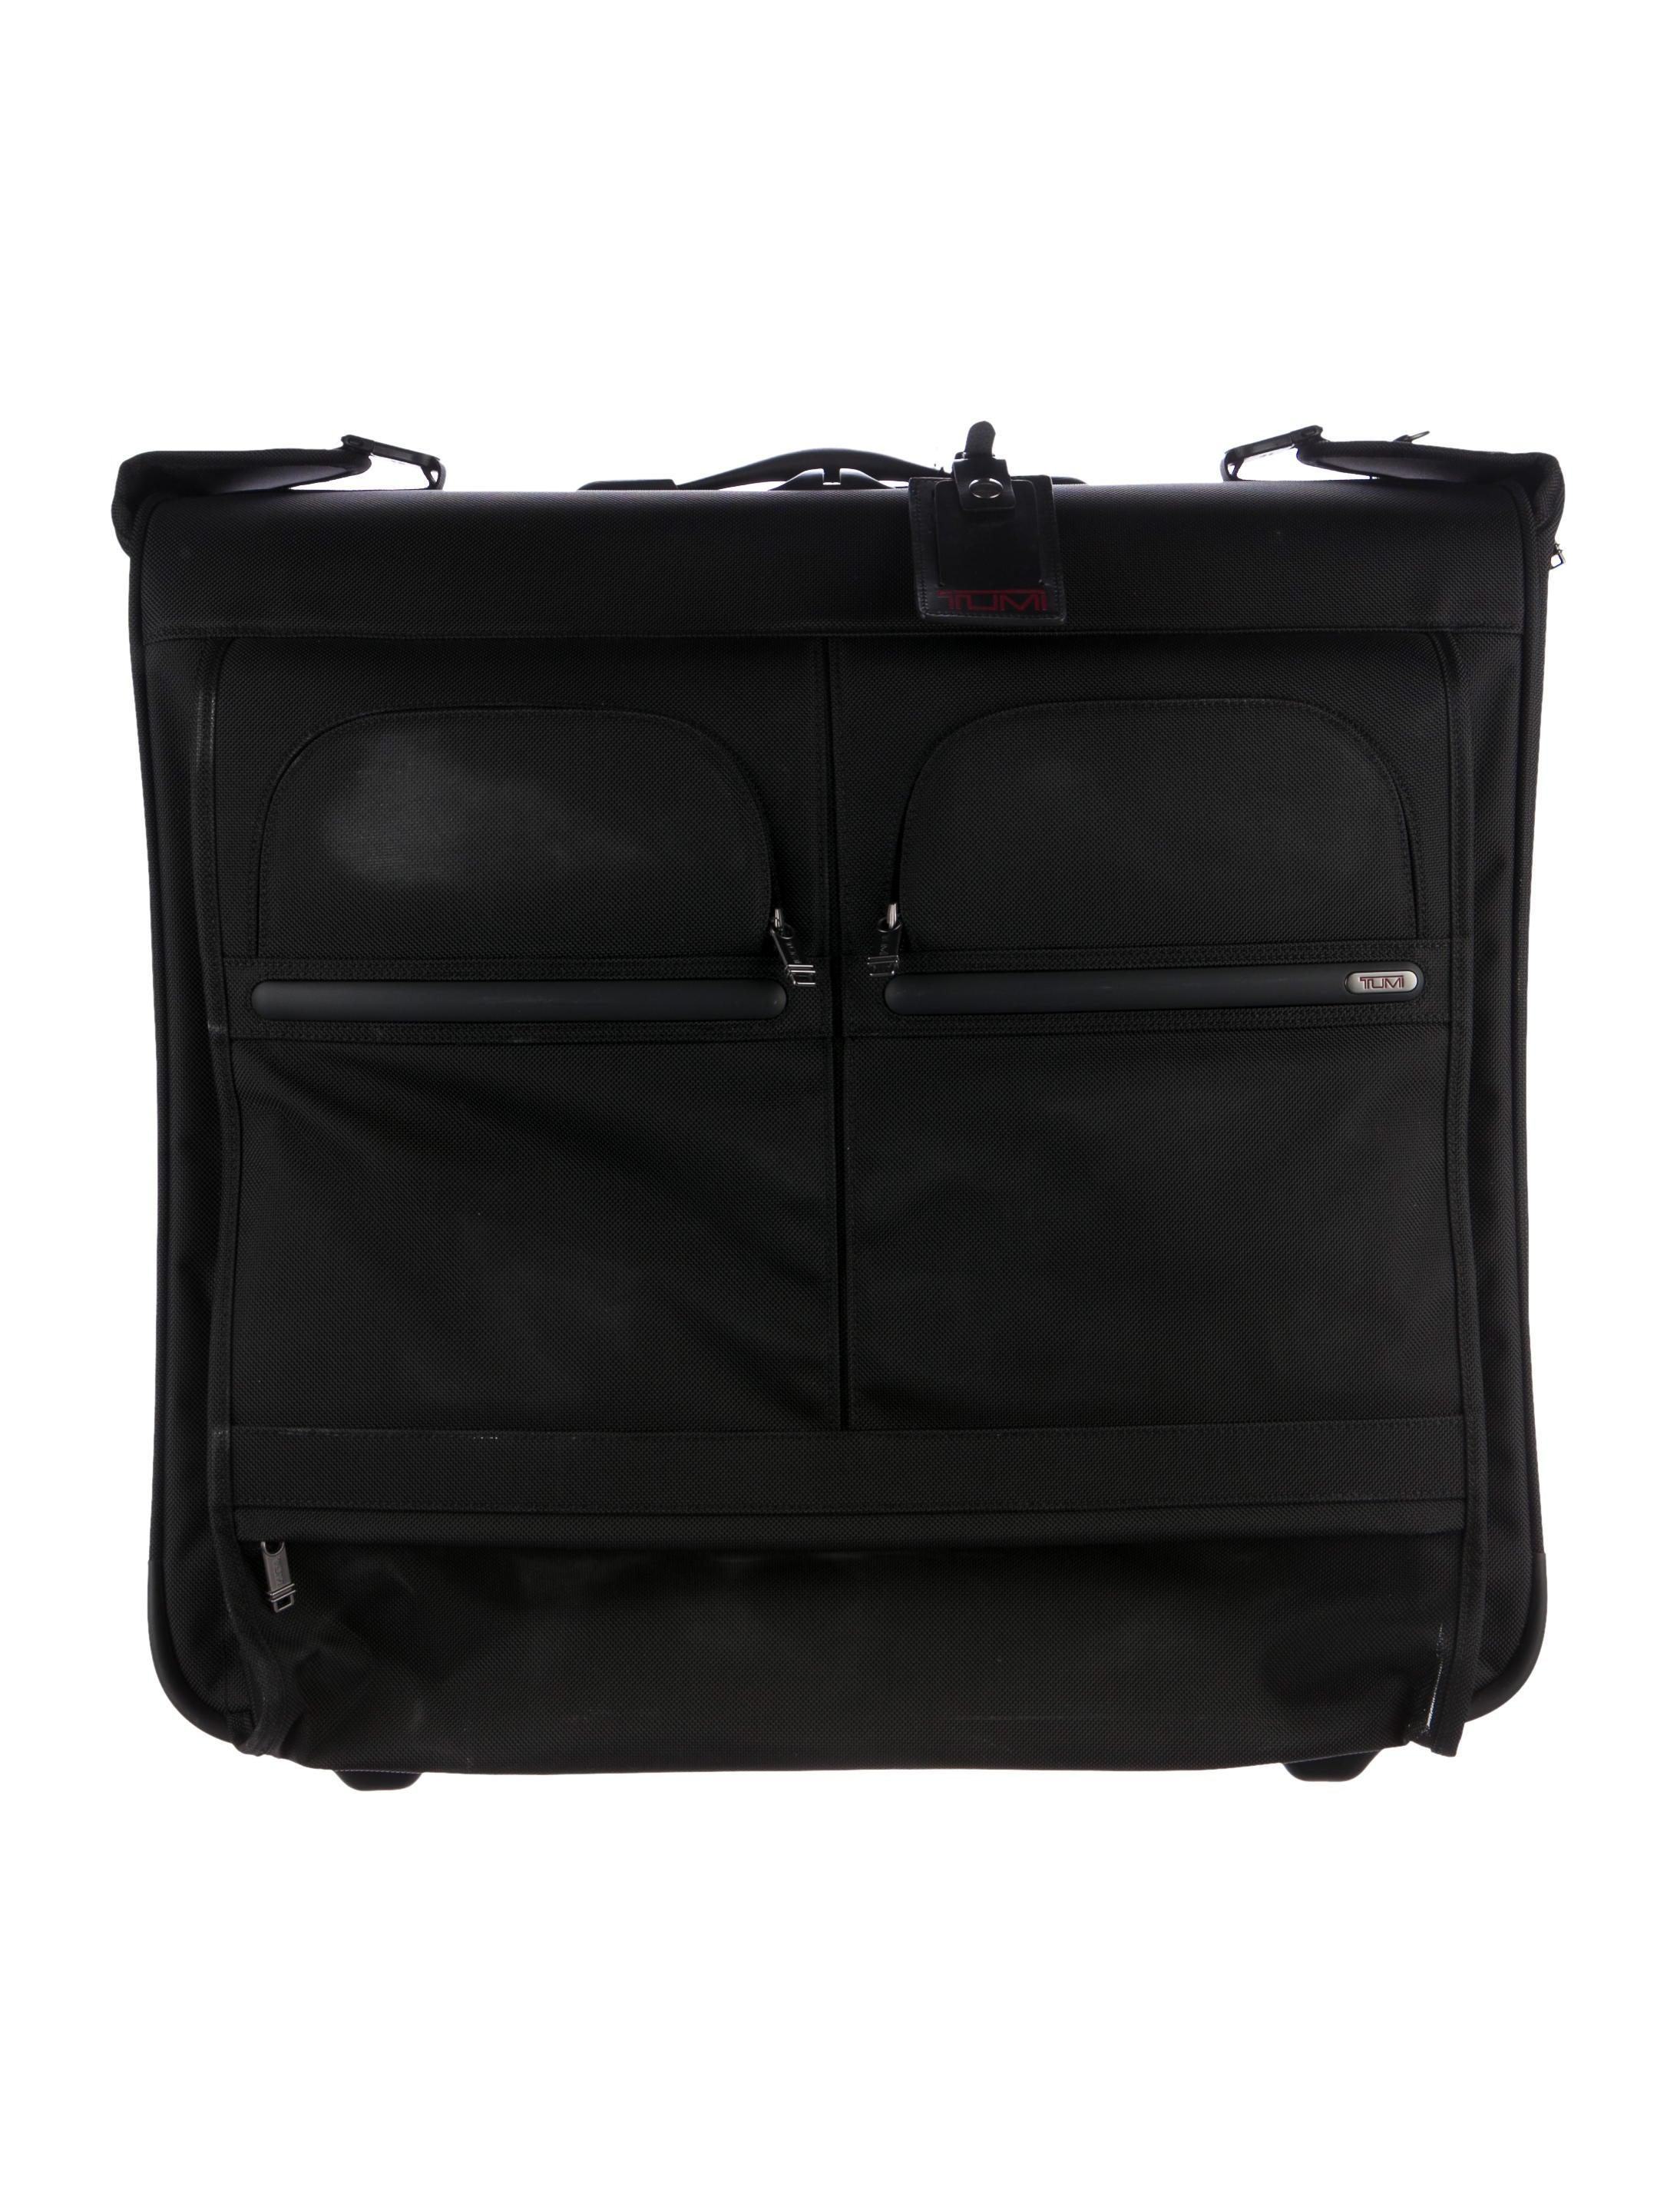 Tumi Long Wheeled Garment Bag - Bags - TMI21798 | The RealReal